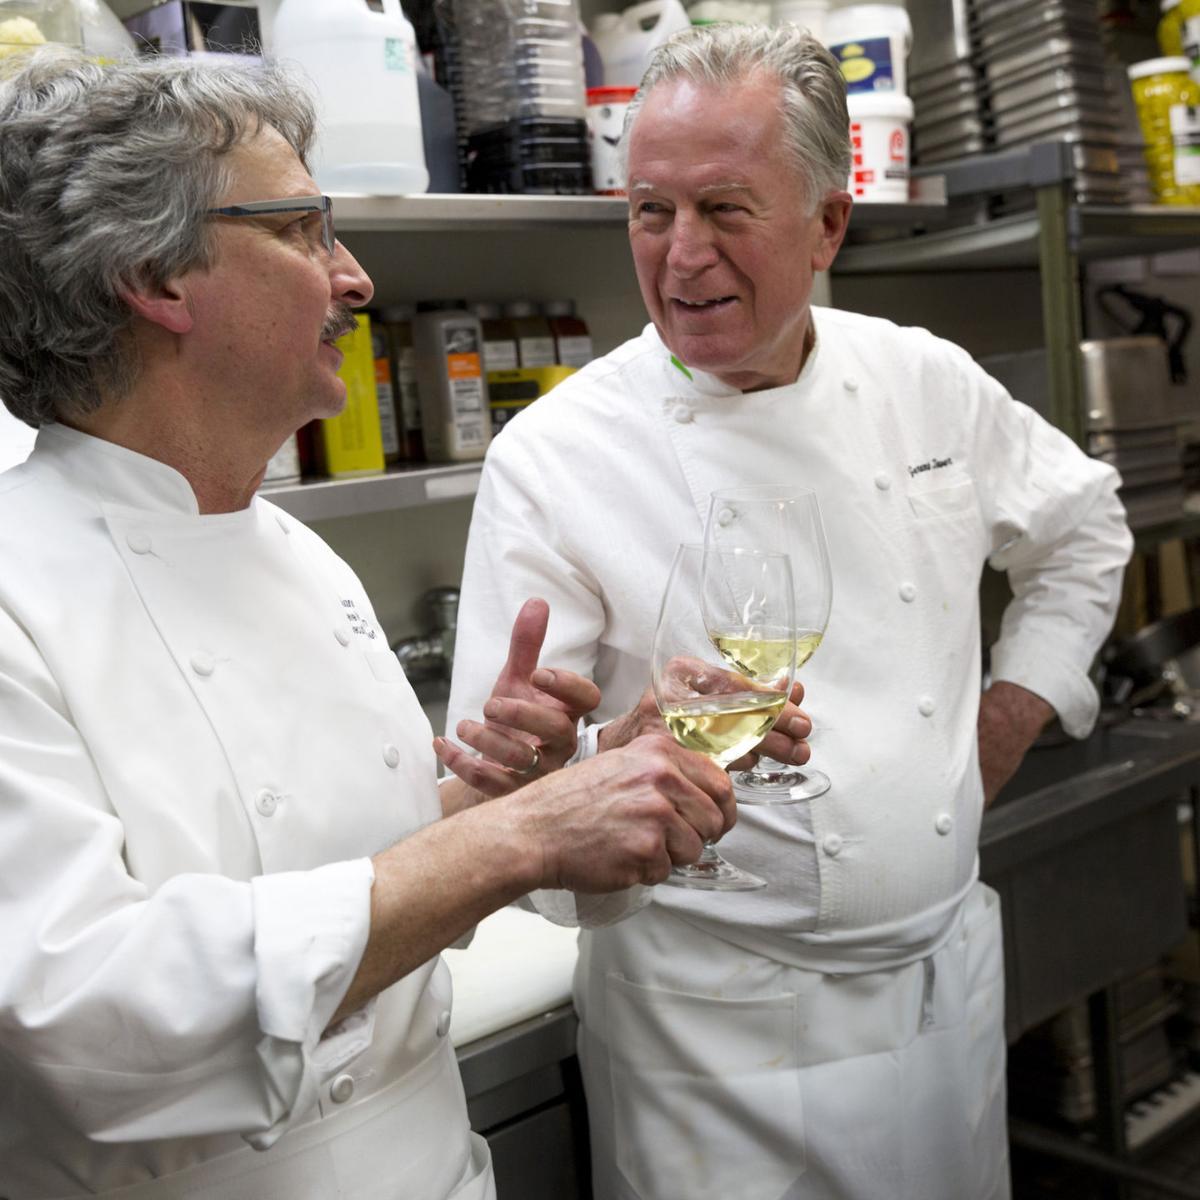 Influential chef Jeremiah Tower visits Gianni\'s in Wayzata | Wayzata ...